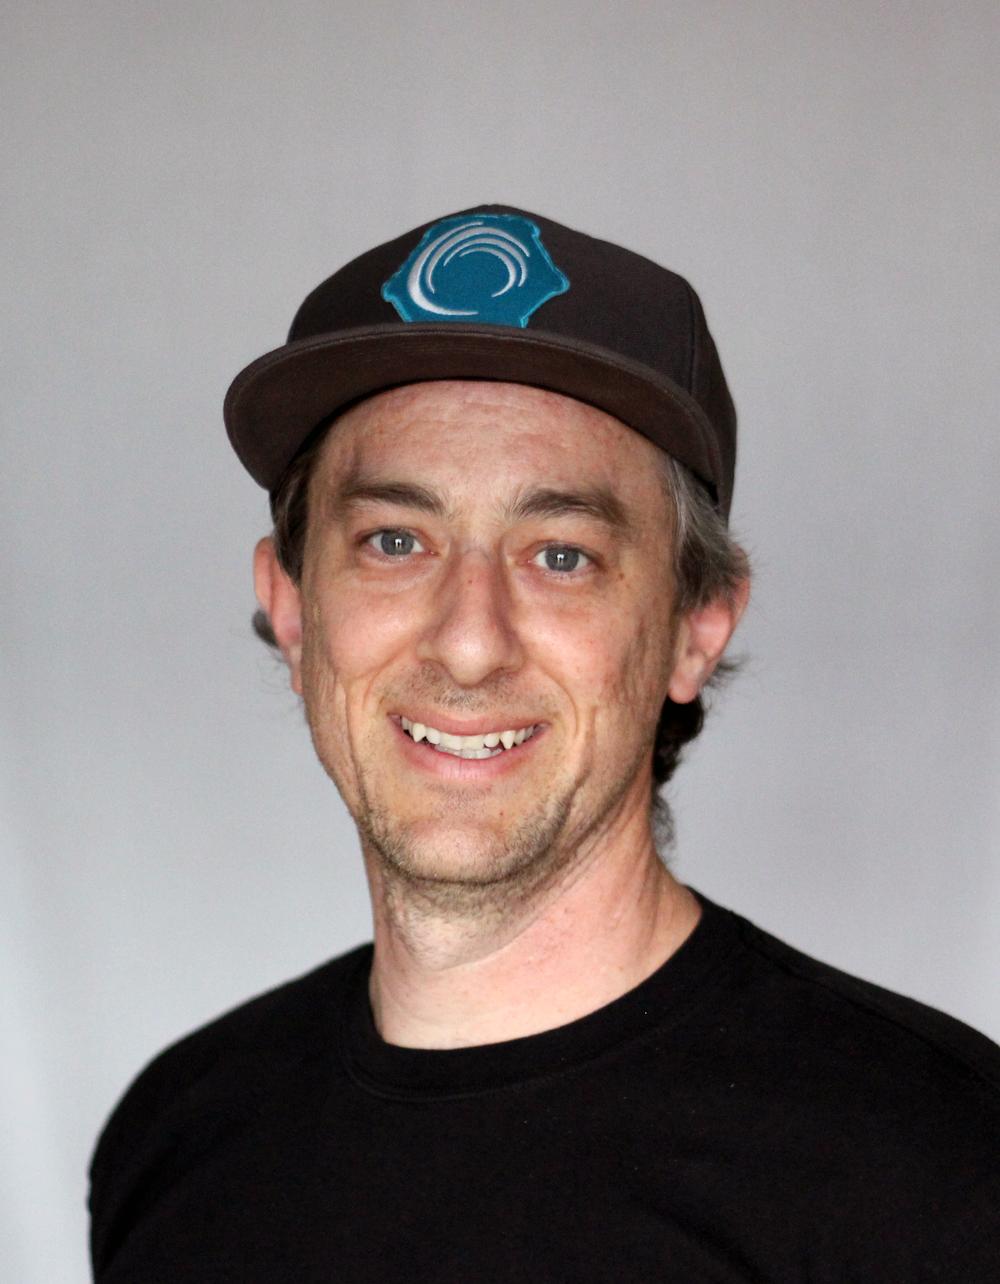 Adam Sharp - Mechanical Design Engineer